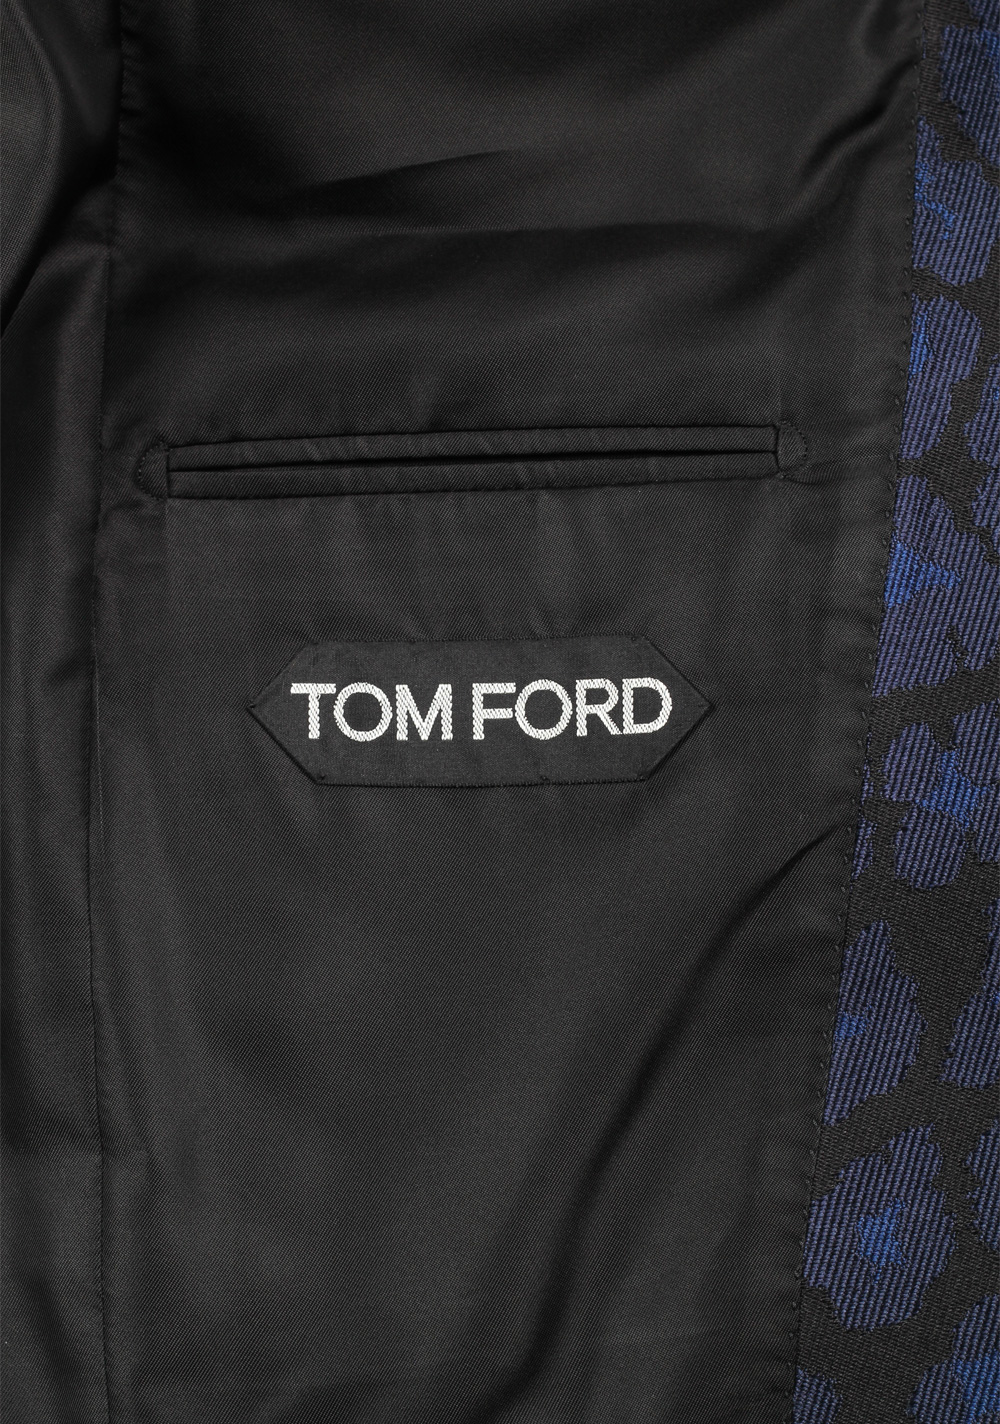 TOM FORD Atticus Blue Silk Tuxedo Dinner Jacket Size 46 / 36R U.S.   Costume Limité